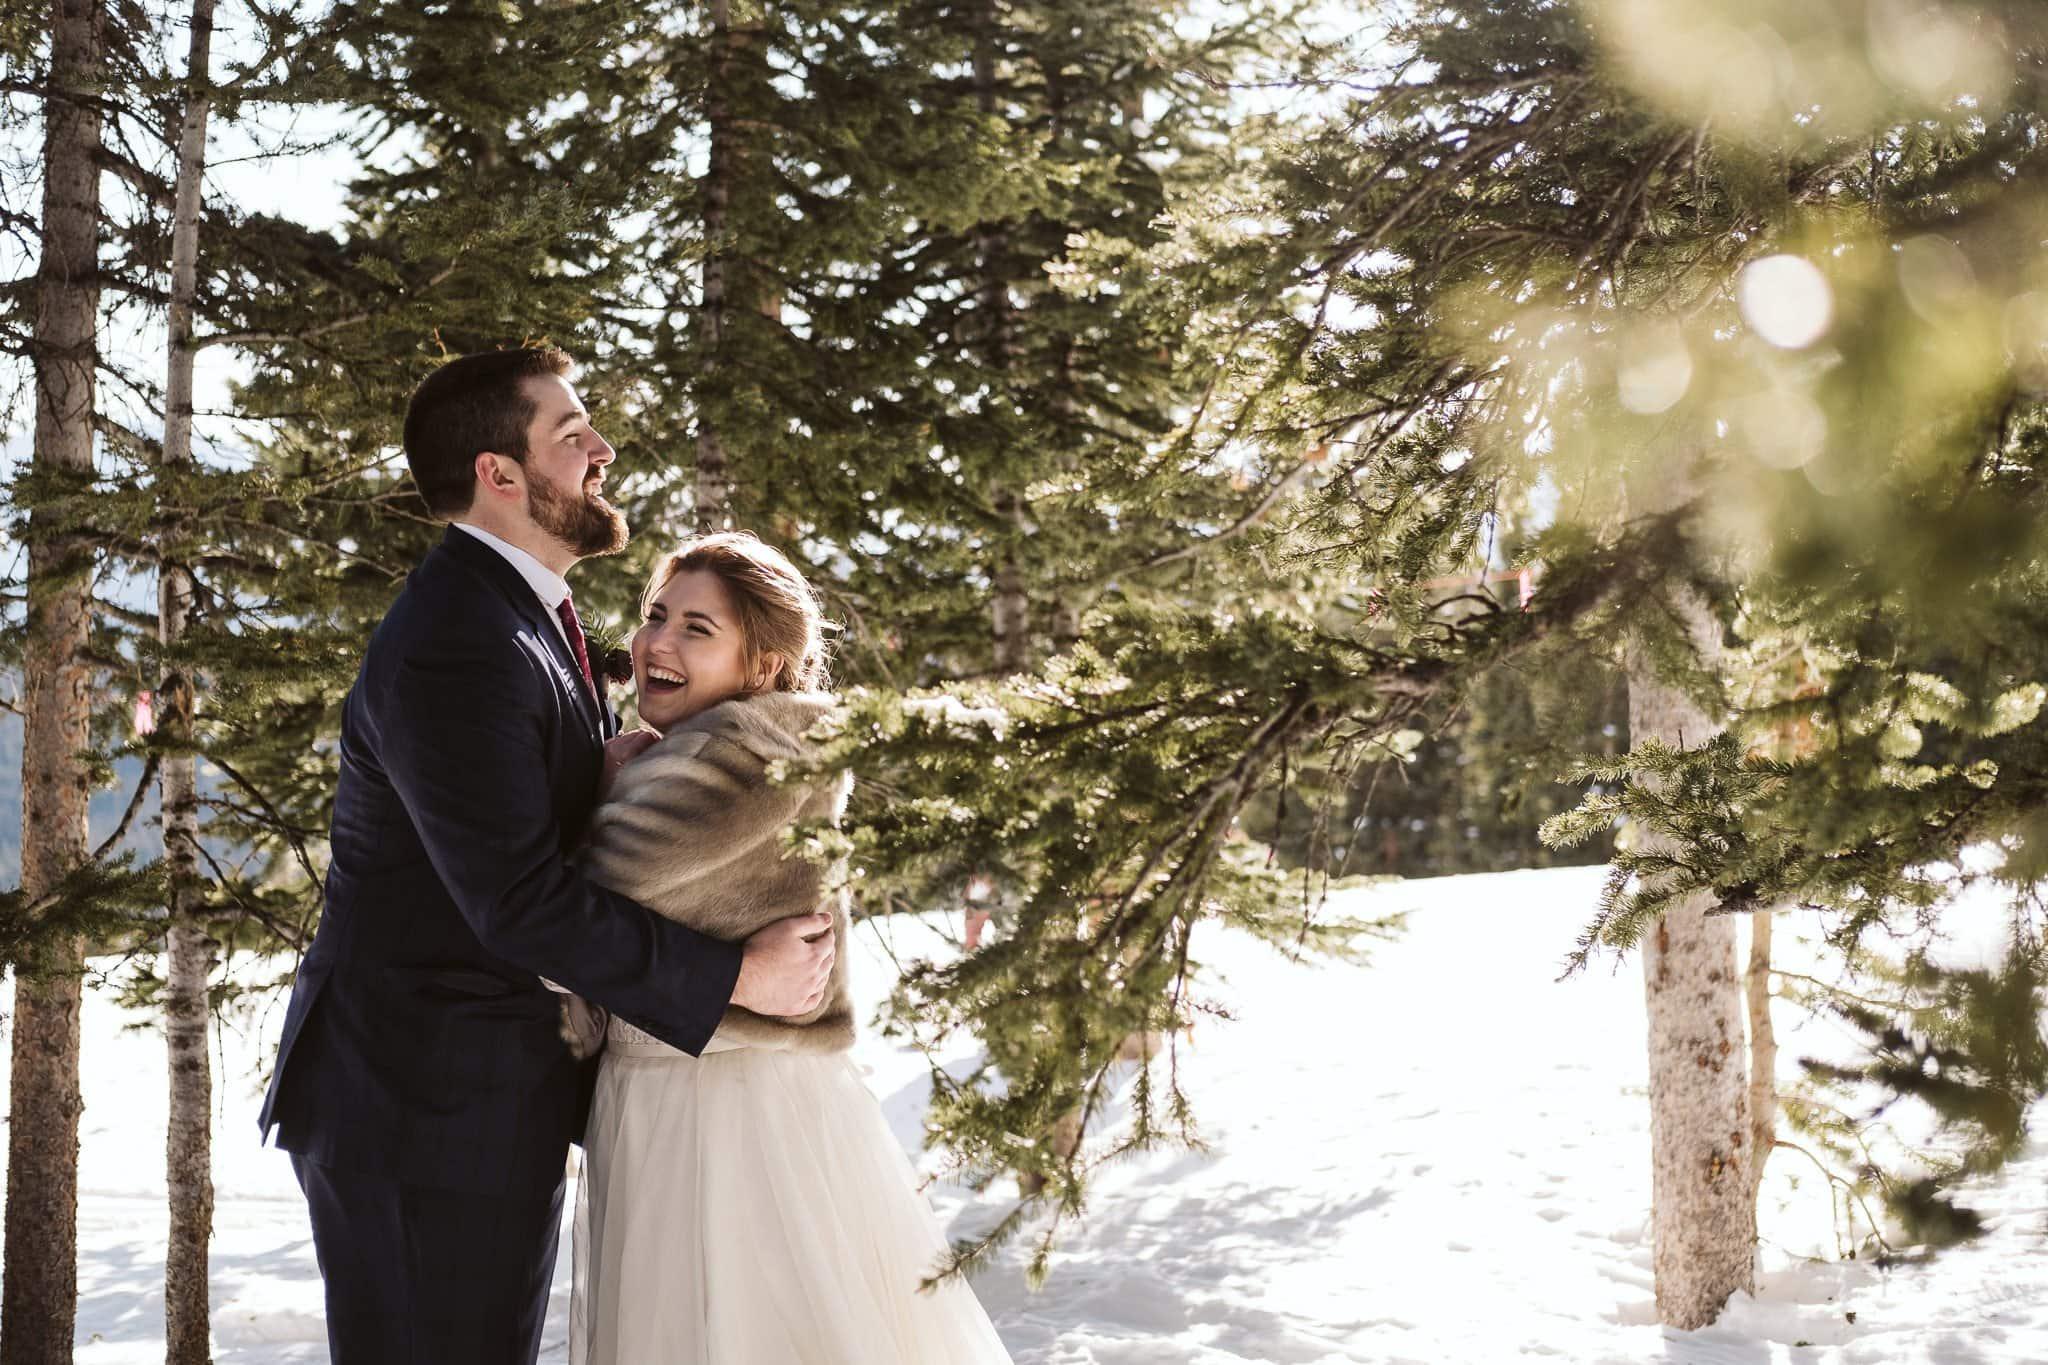 Colorado winter elopement in snowy forest.